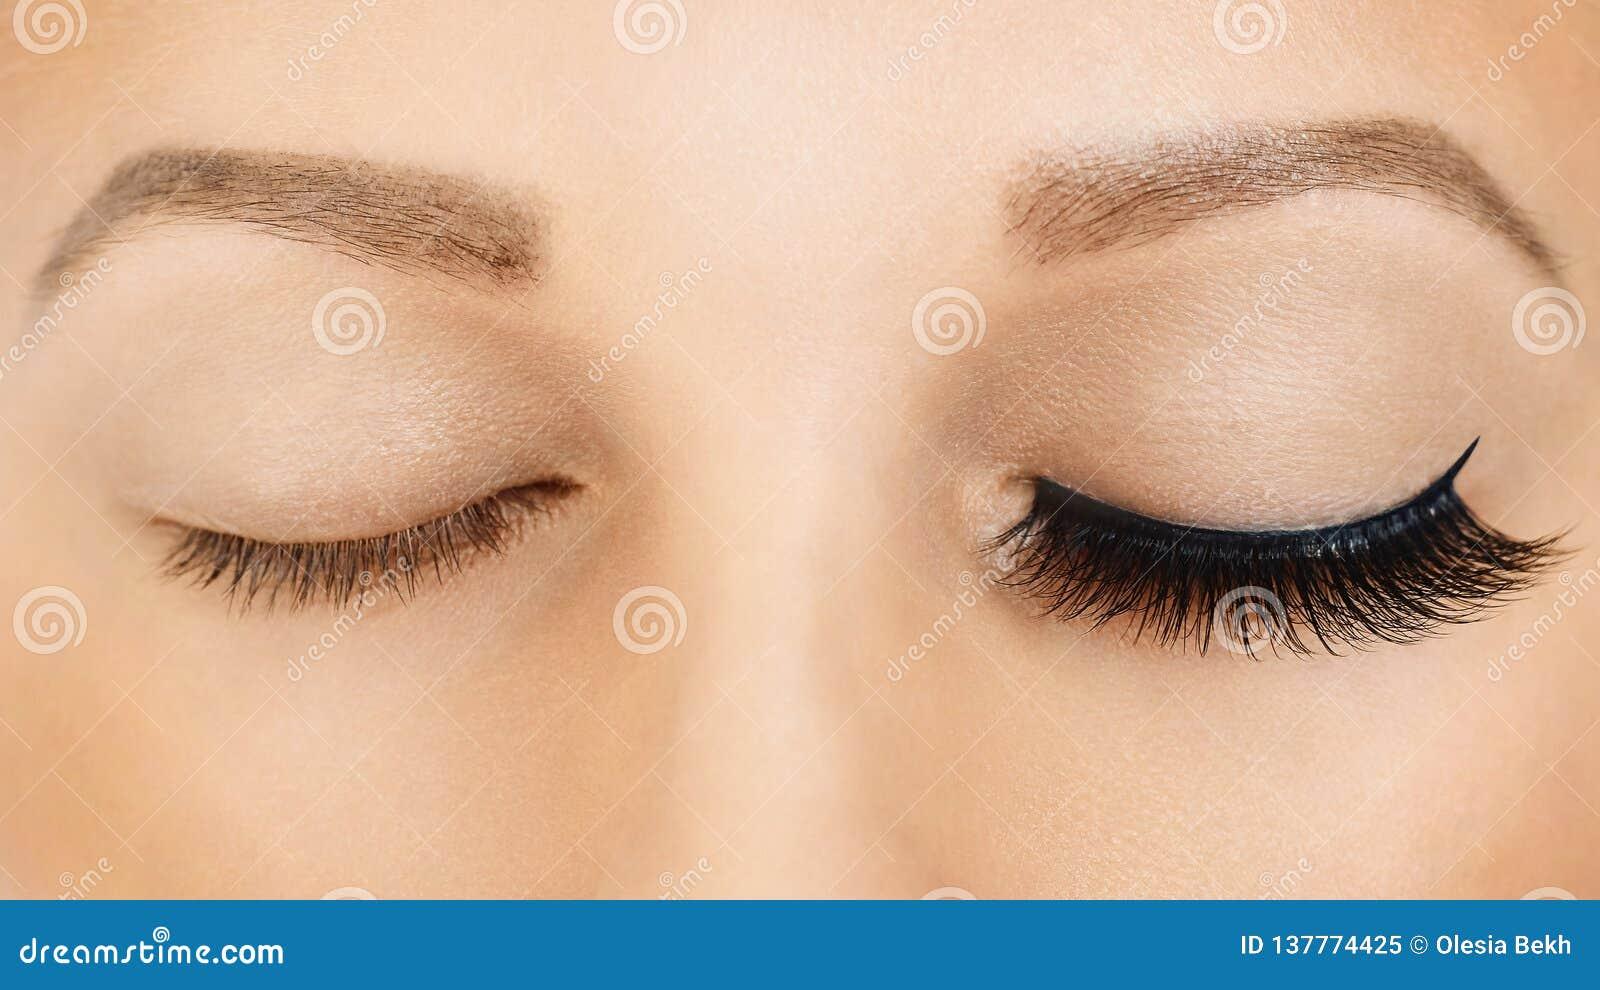 Female eyes with long false eyelashes, befor and after effect. Eyelash extensions, make-up, cosmetics, beauty